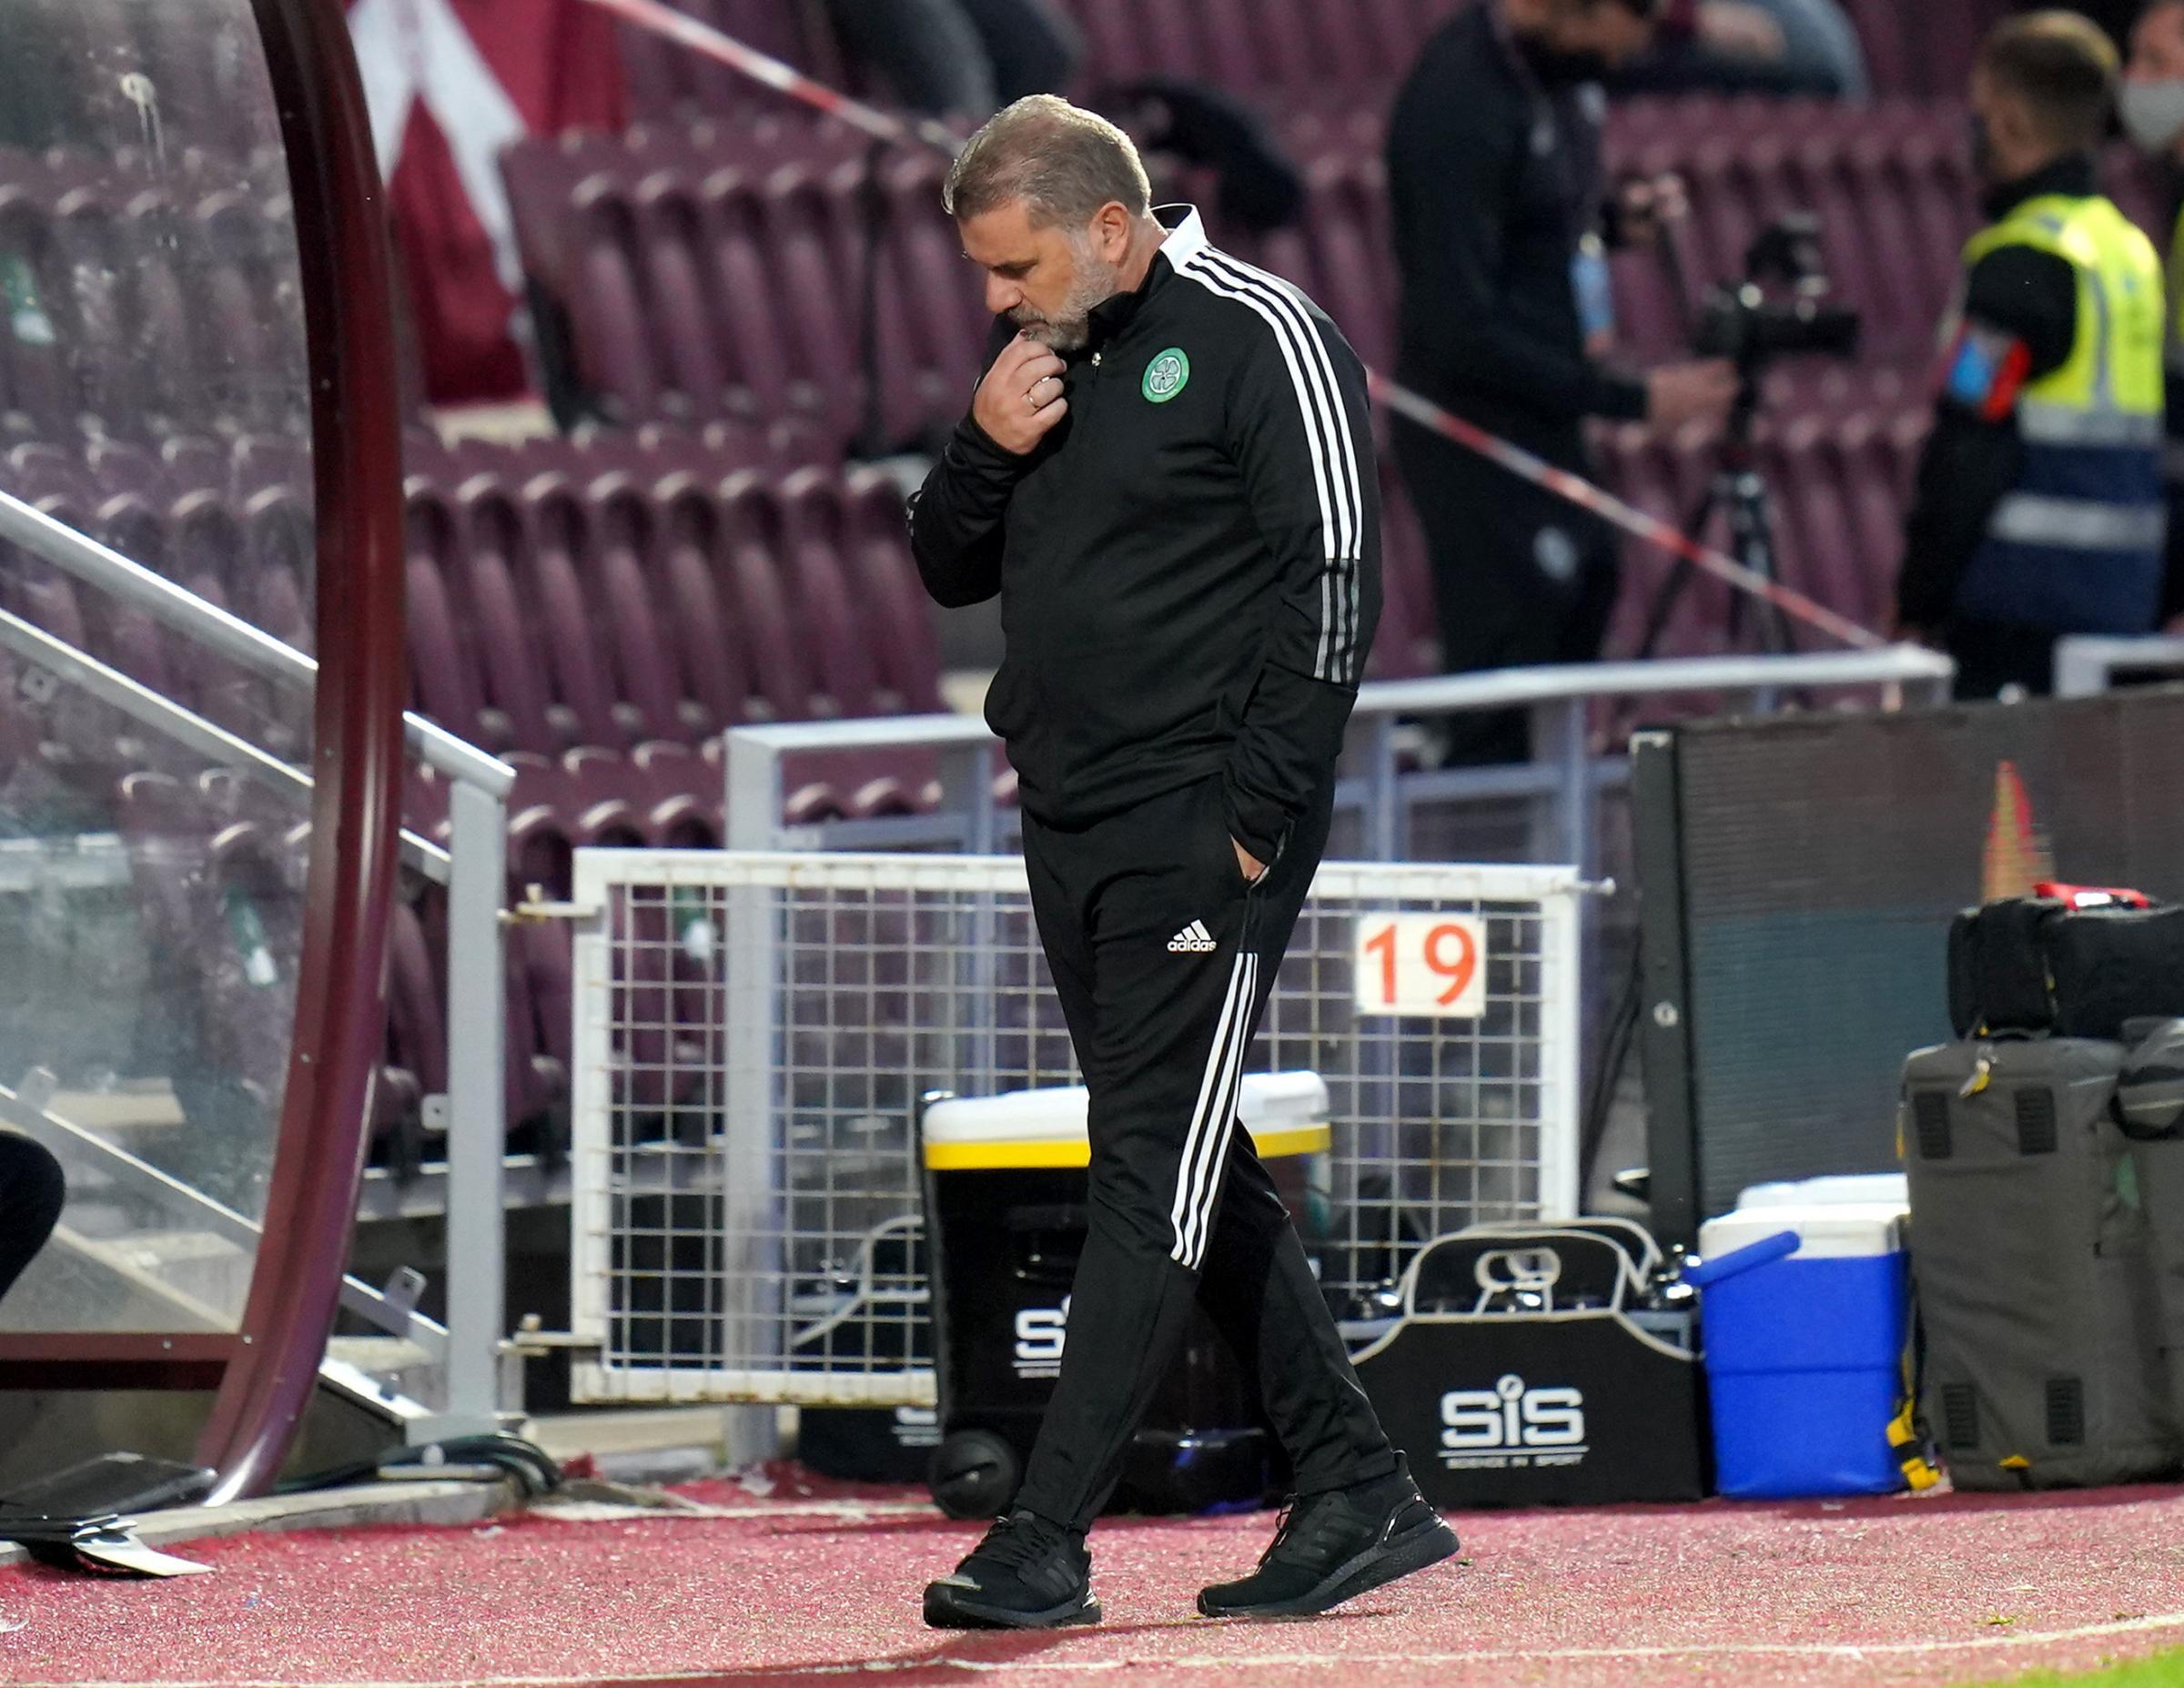 Celtic board have thrown Ange Postecoglou under a bus, insists Frank McAvennie